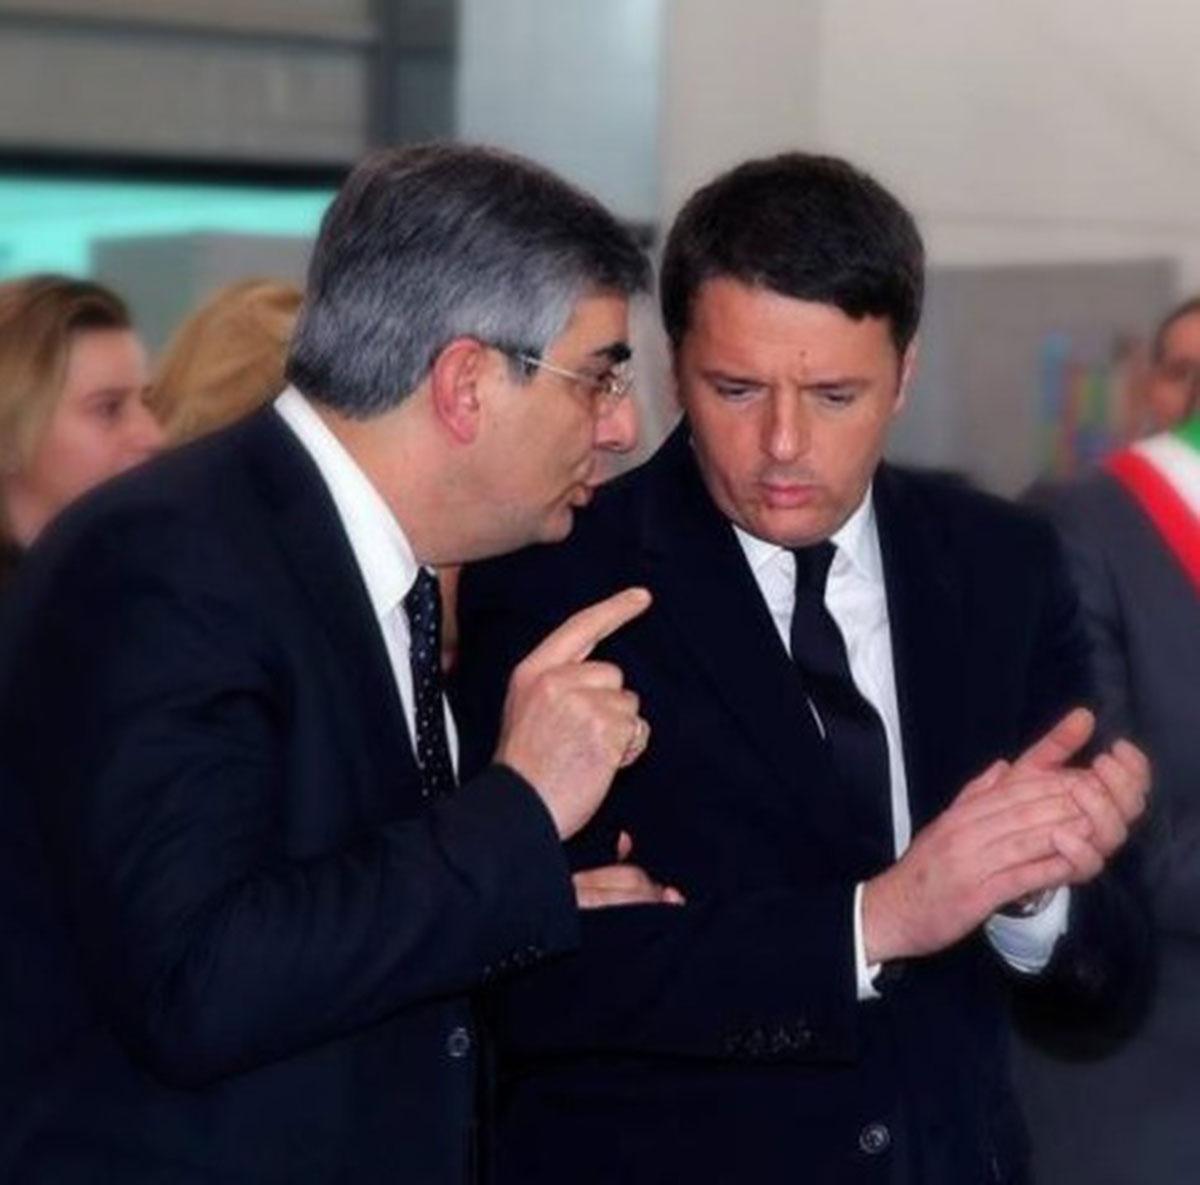 Marco Sonsini, partner atTelos A&S,on Politico Europe